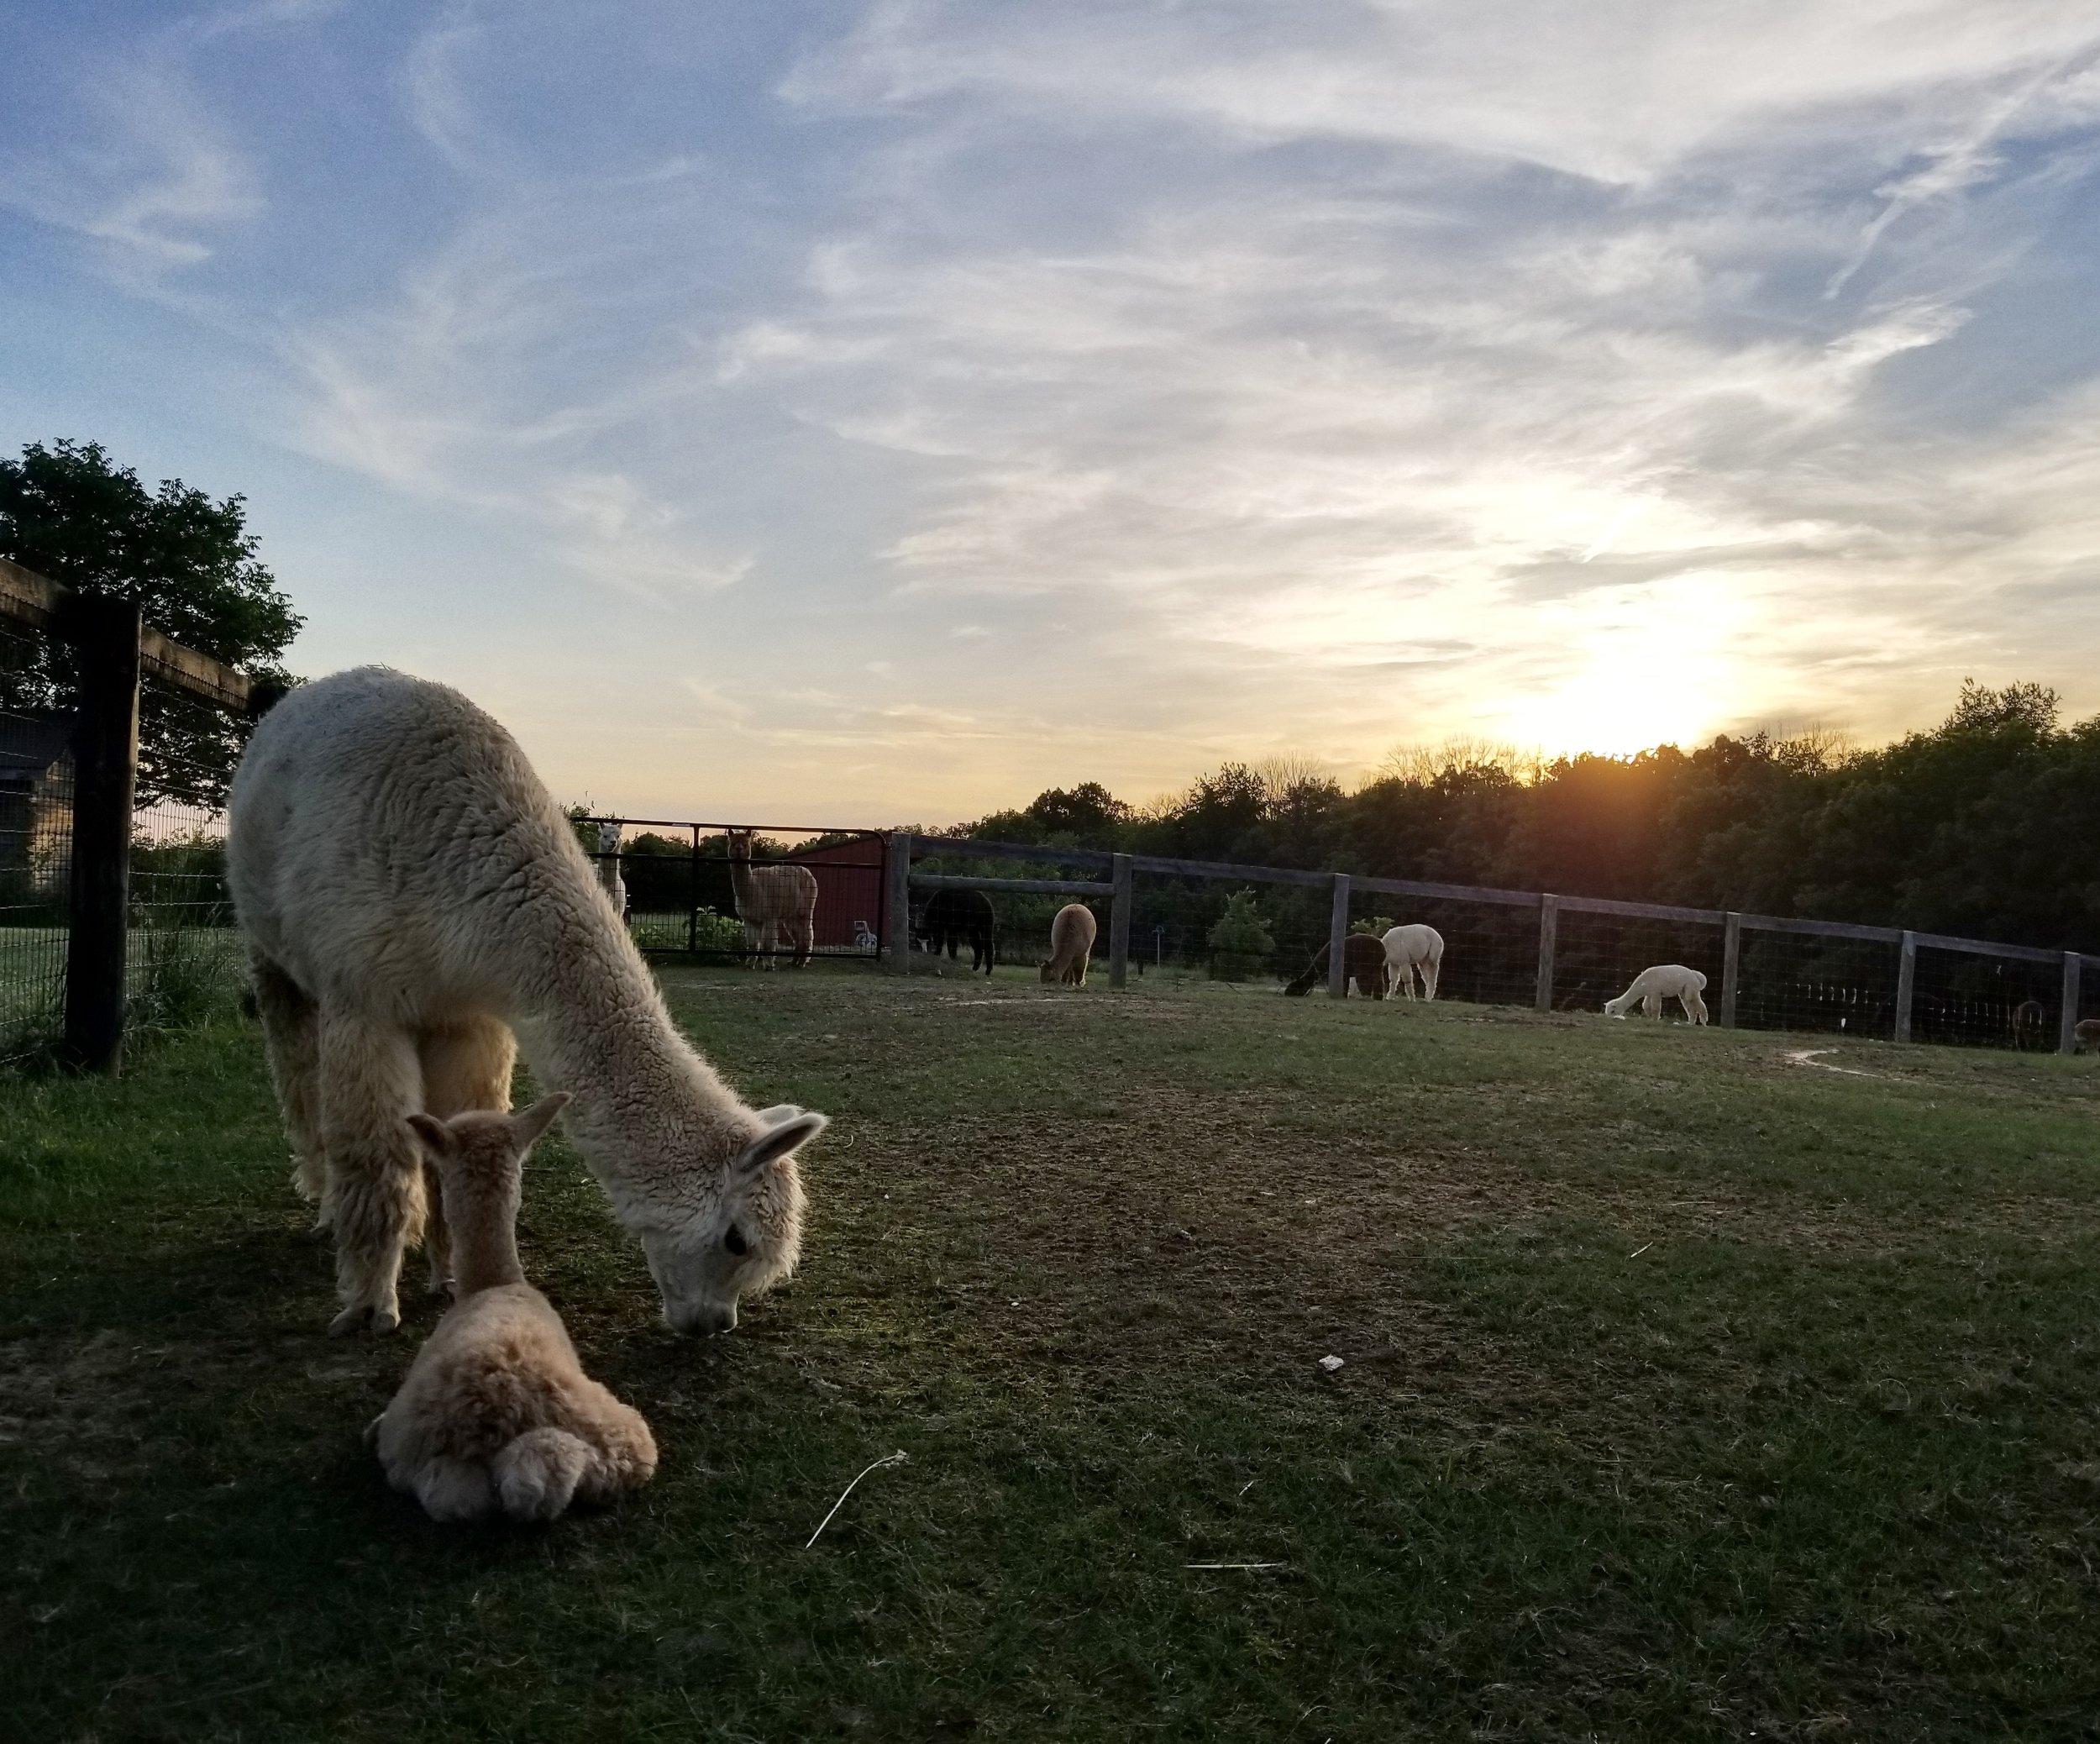 Image via:  Wampa Stomp Farm